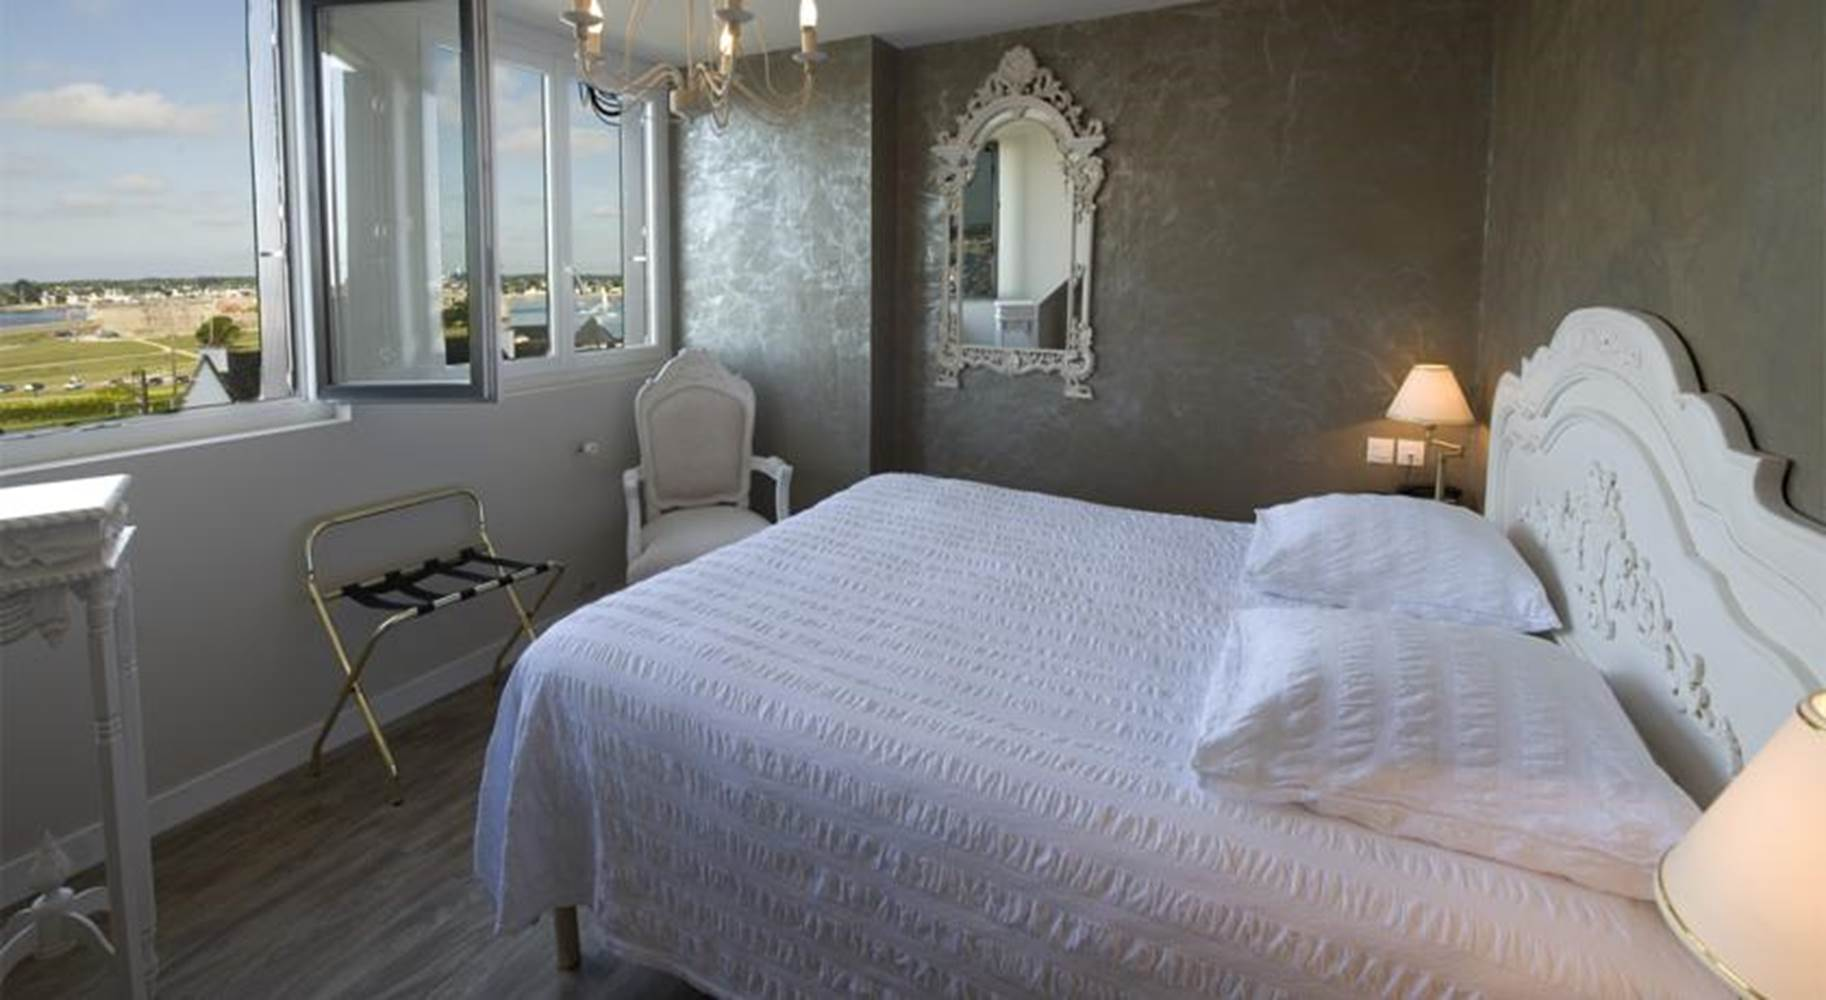 Hotel de la Citadelle - Bretagne sud - Lorient - Port Louis - Chambre grand confort Vue Mer 6 ©